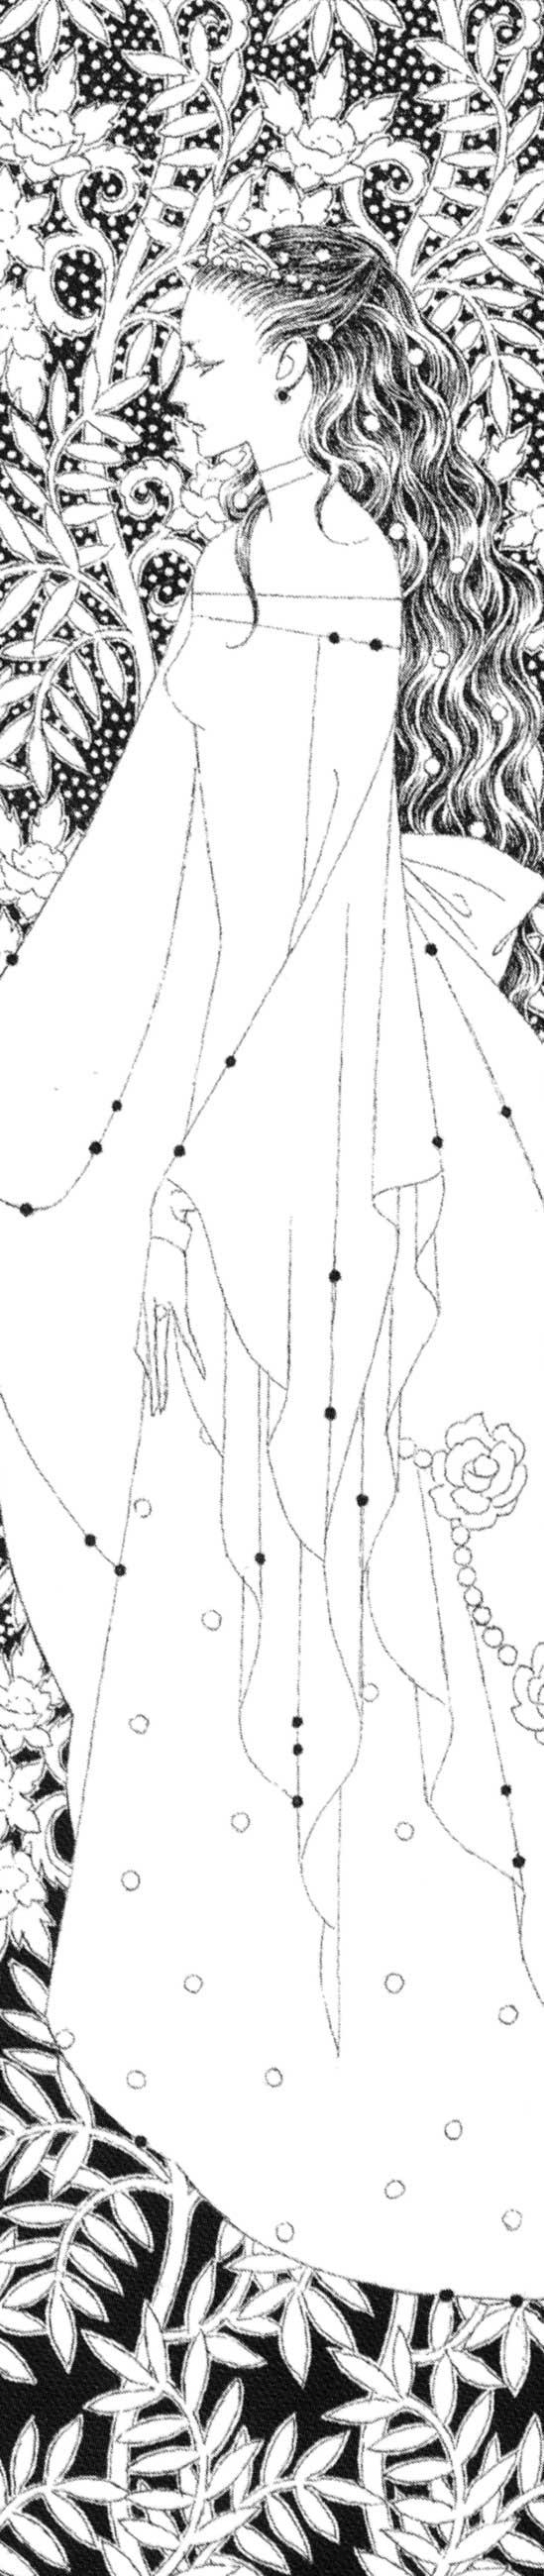 Toshiaki KatoMangaka,Femme FataleArtbook